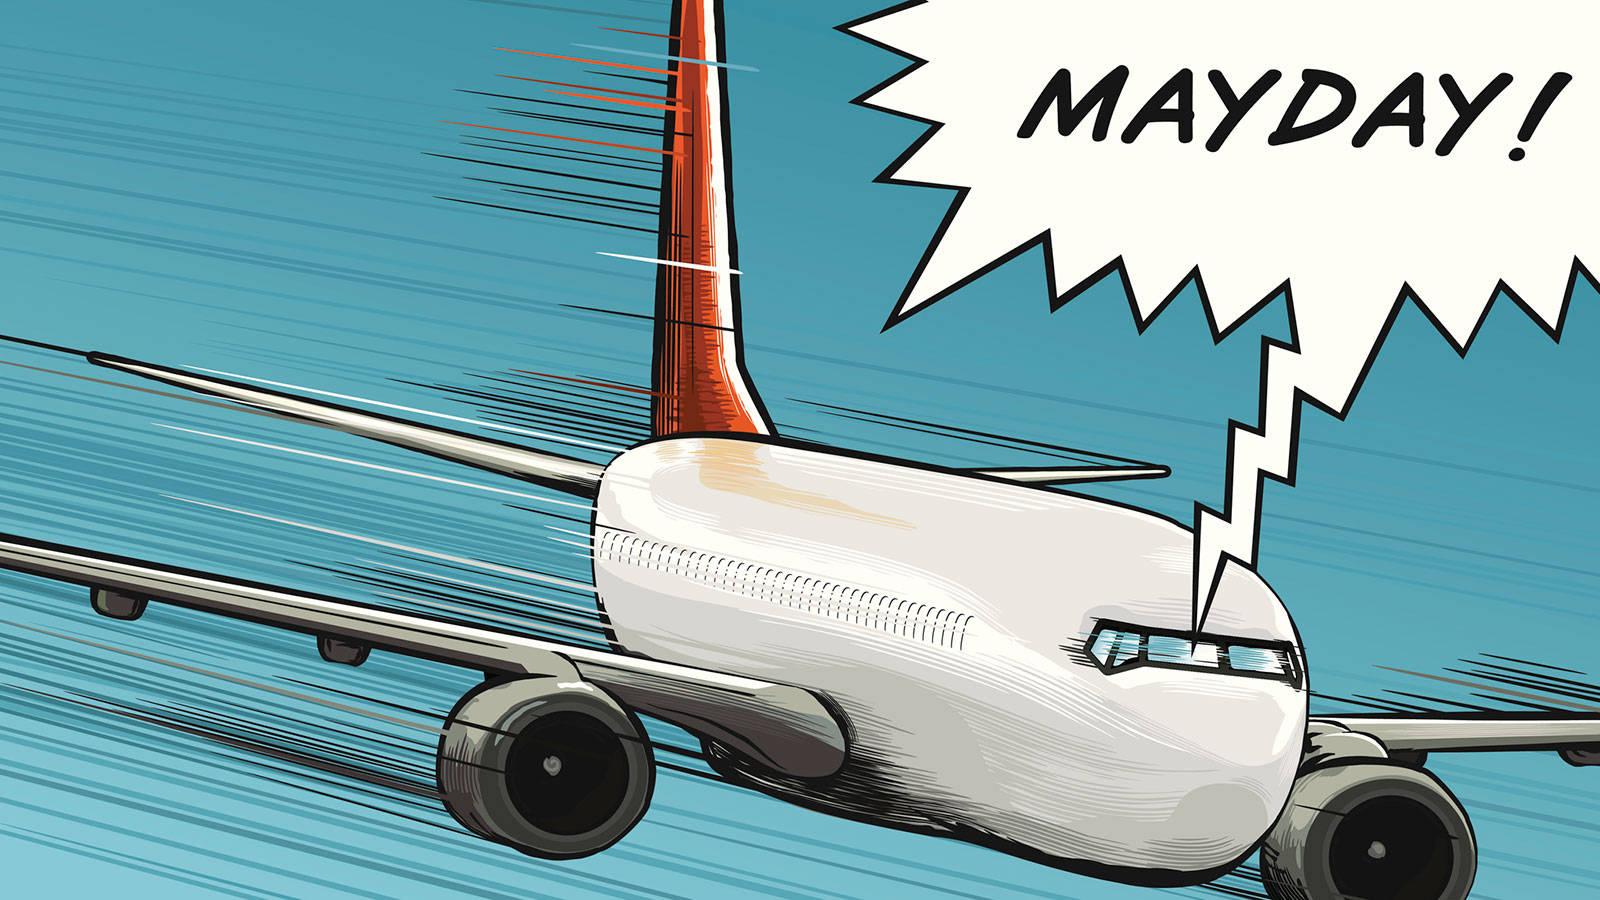 mayday是什么意思啊(什么是mayday)插图